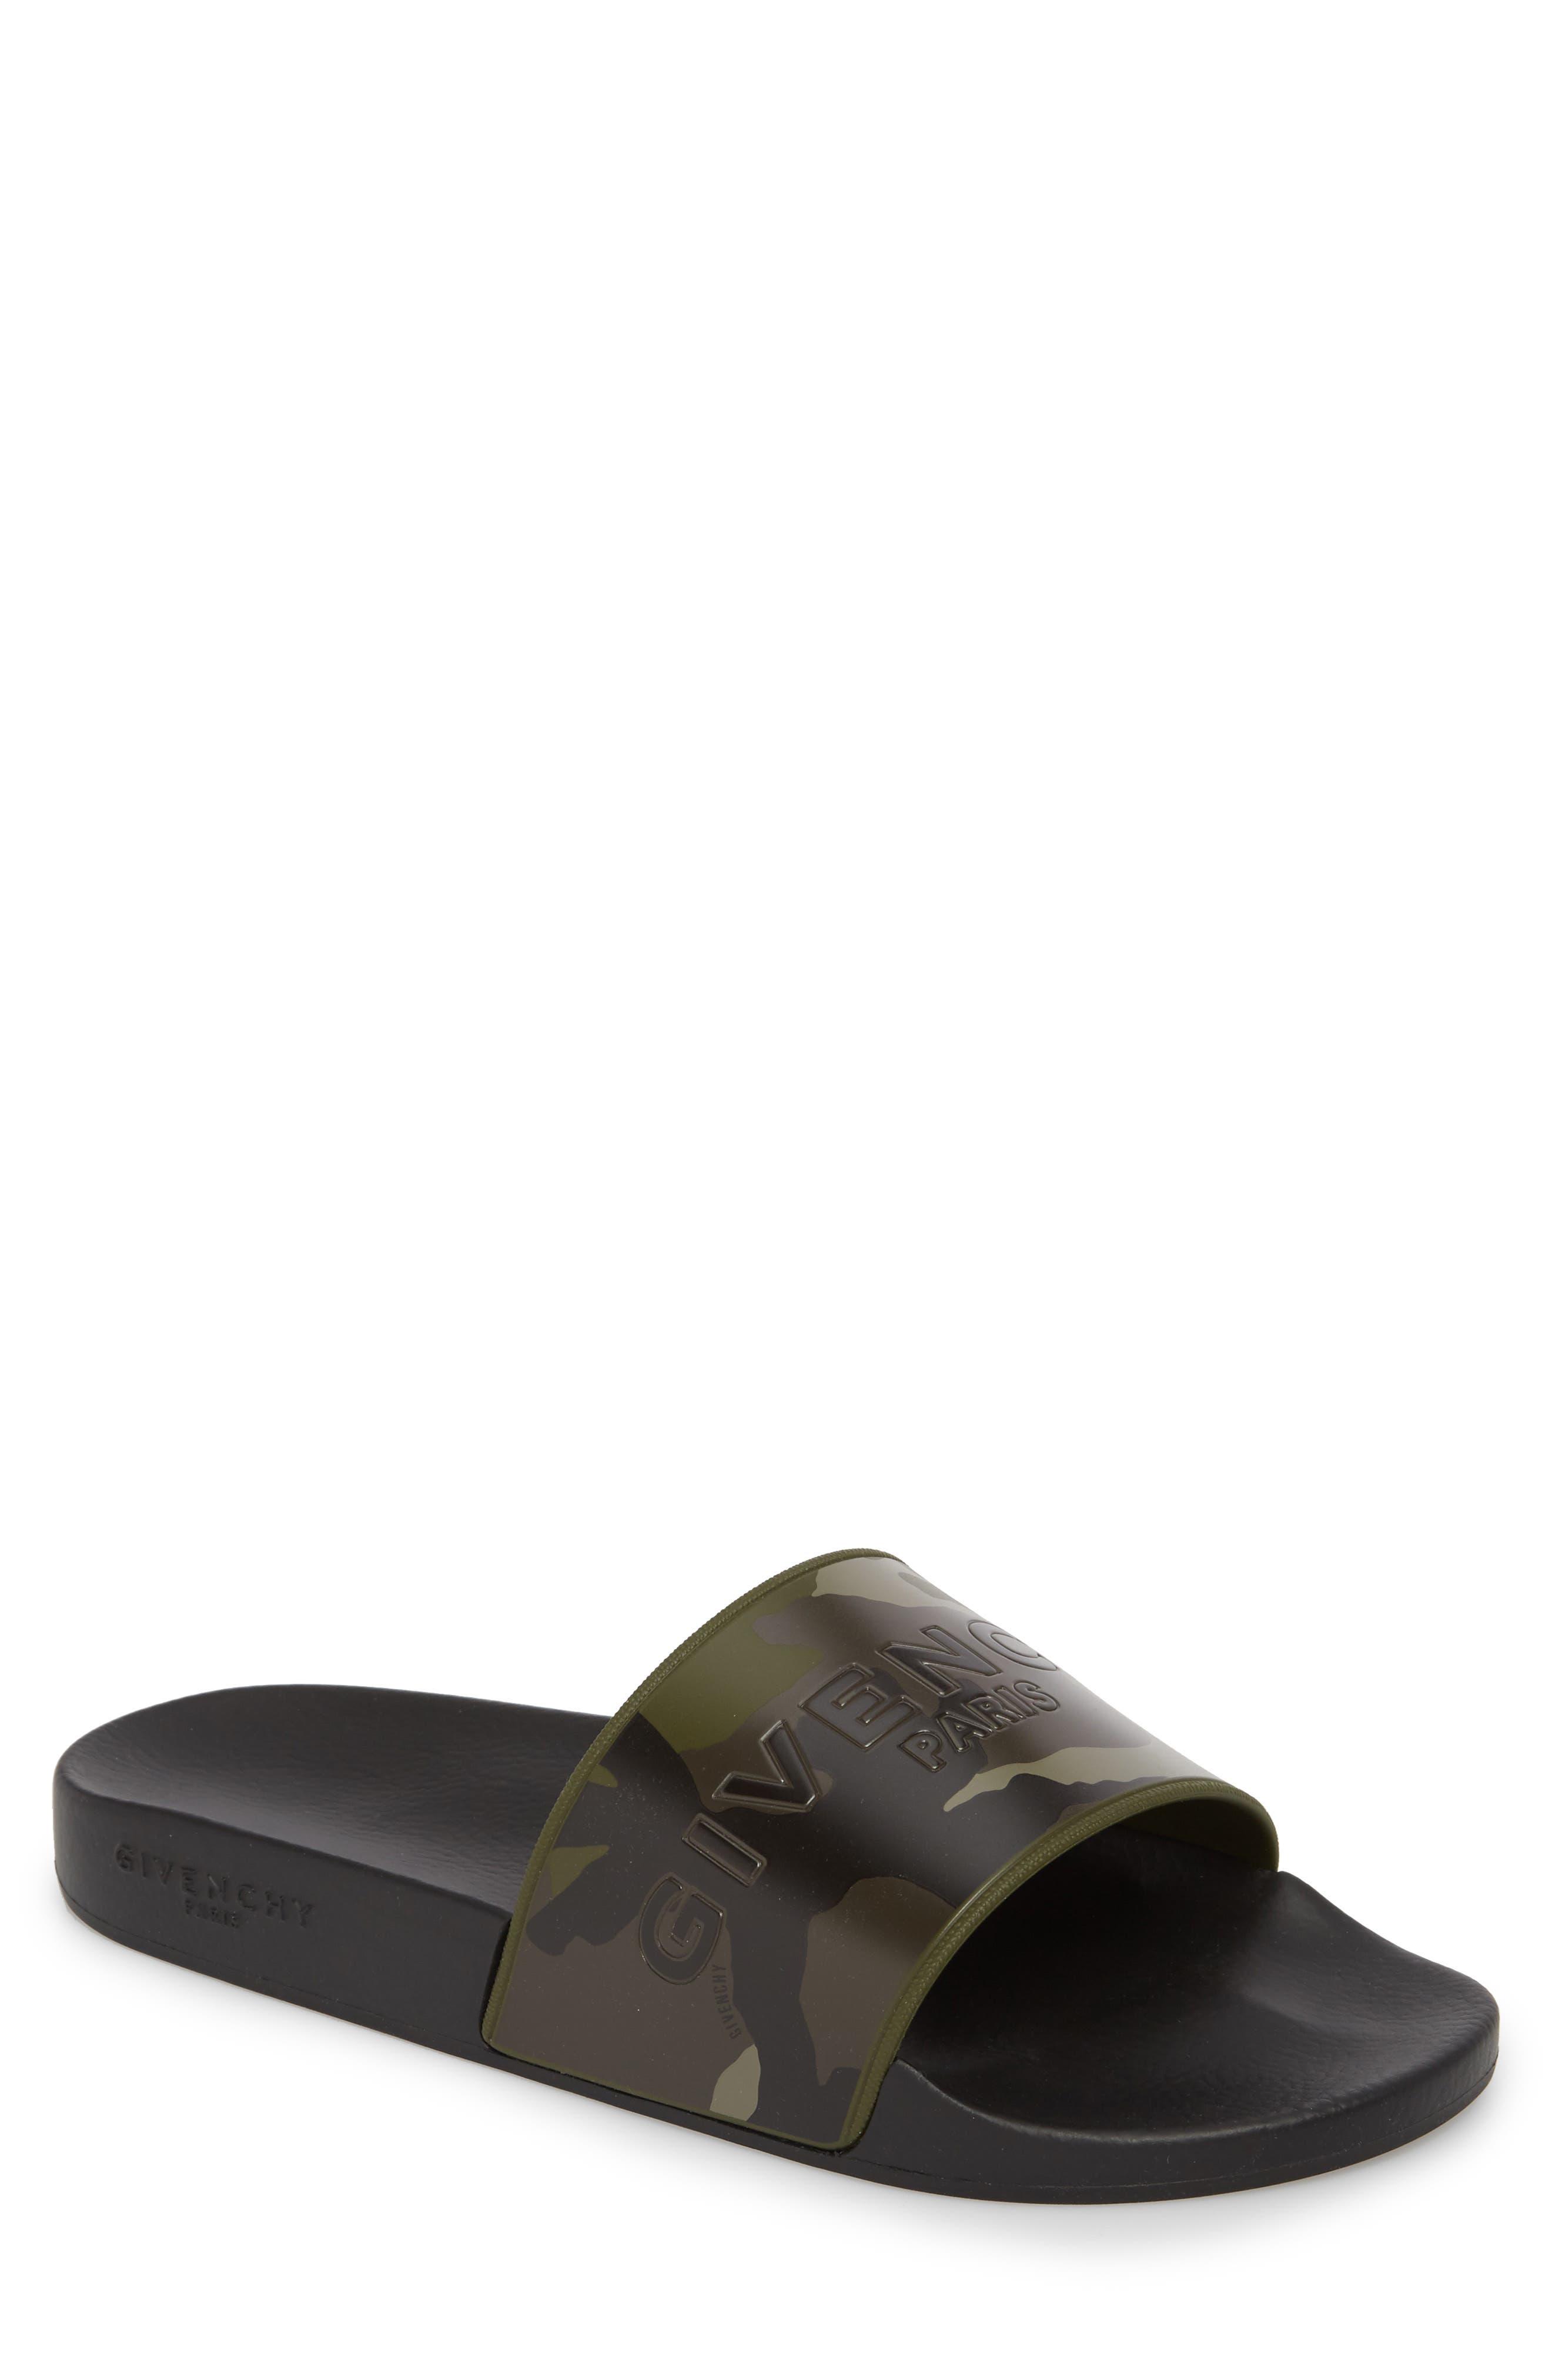 Camo Logo Pool Sandal,                         Main,                         color, Black/ Khaki